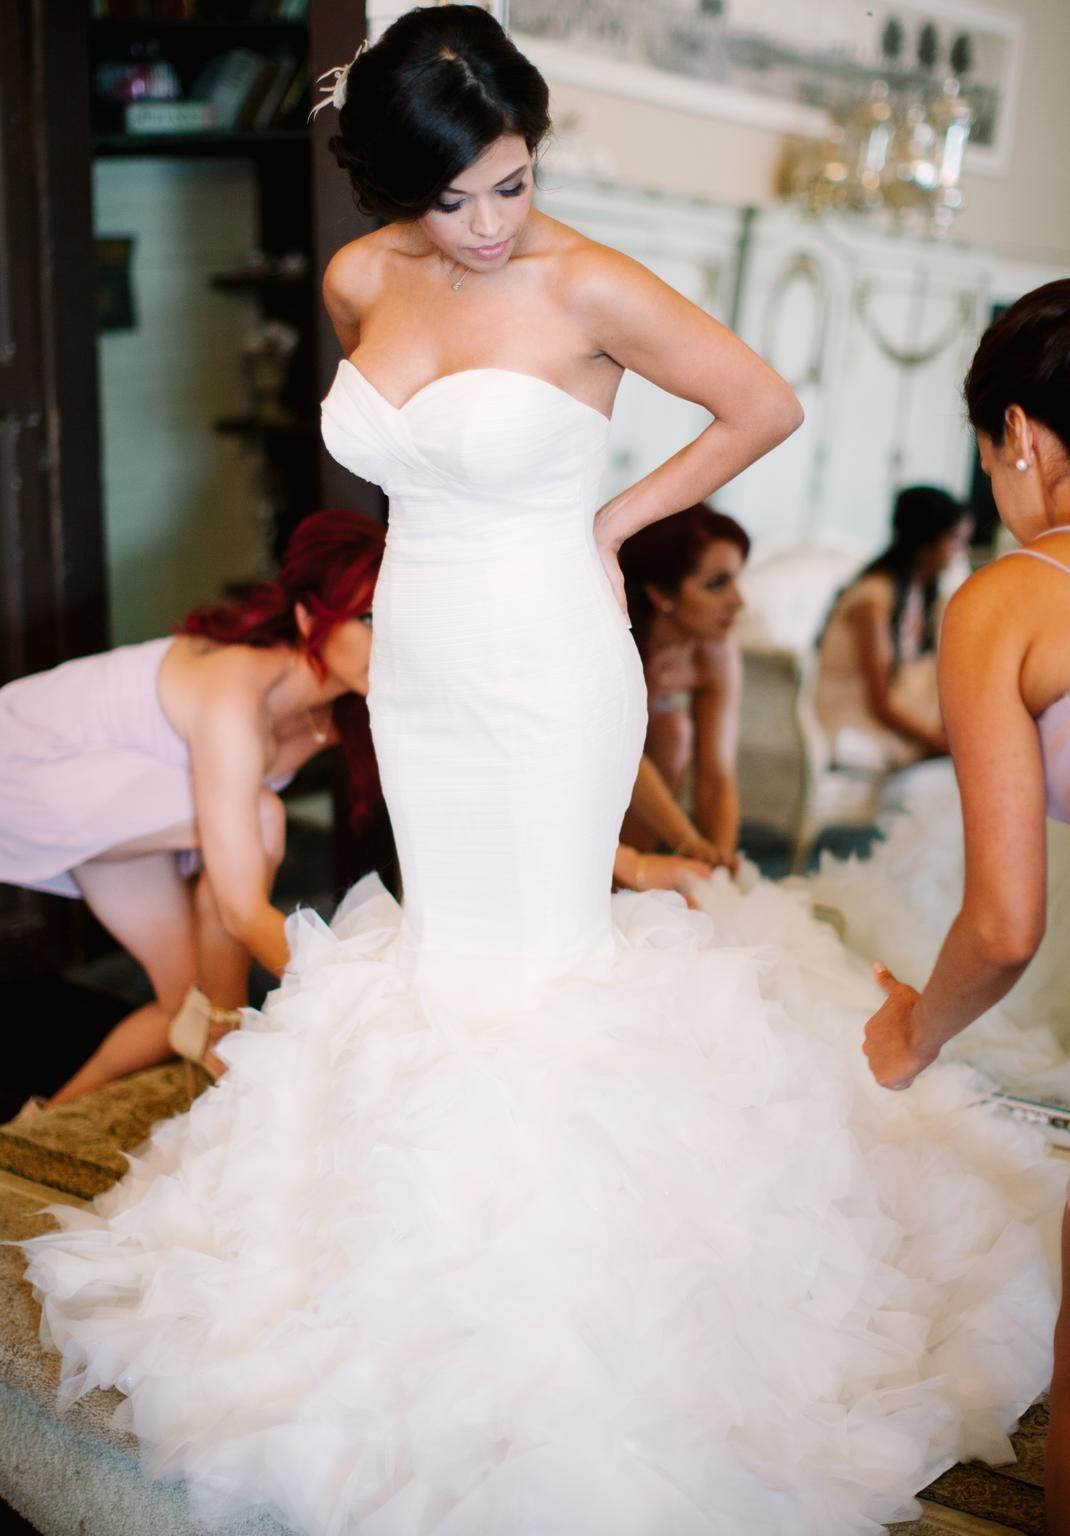 Winnie Couture Esme 8405, $1,200 Size: 0 | Used Wedding Dresses ...